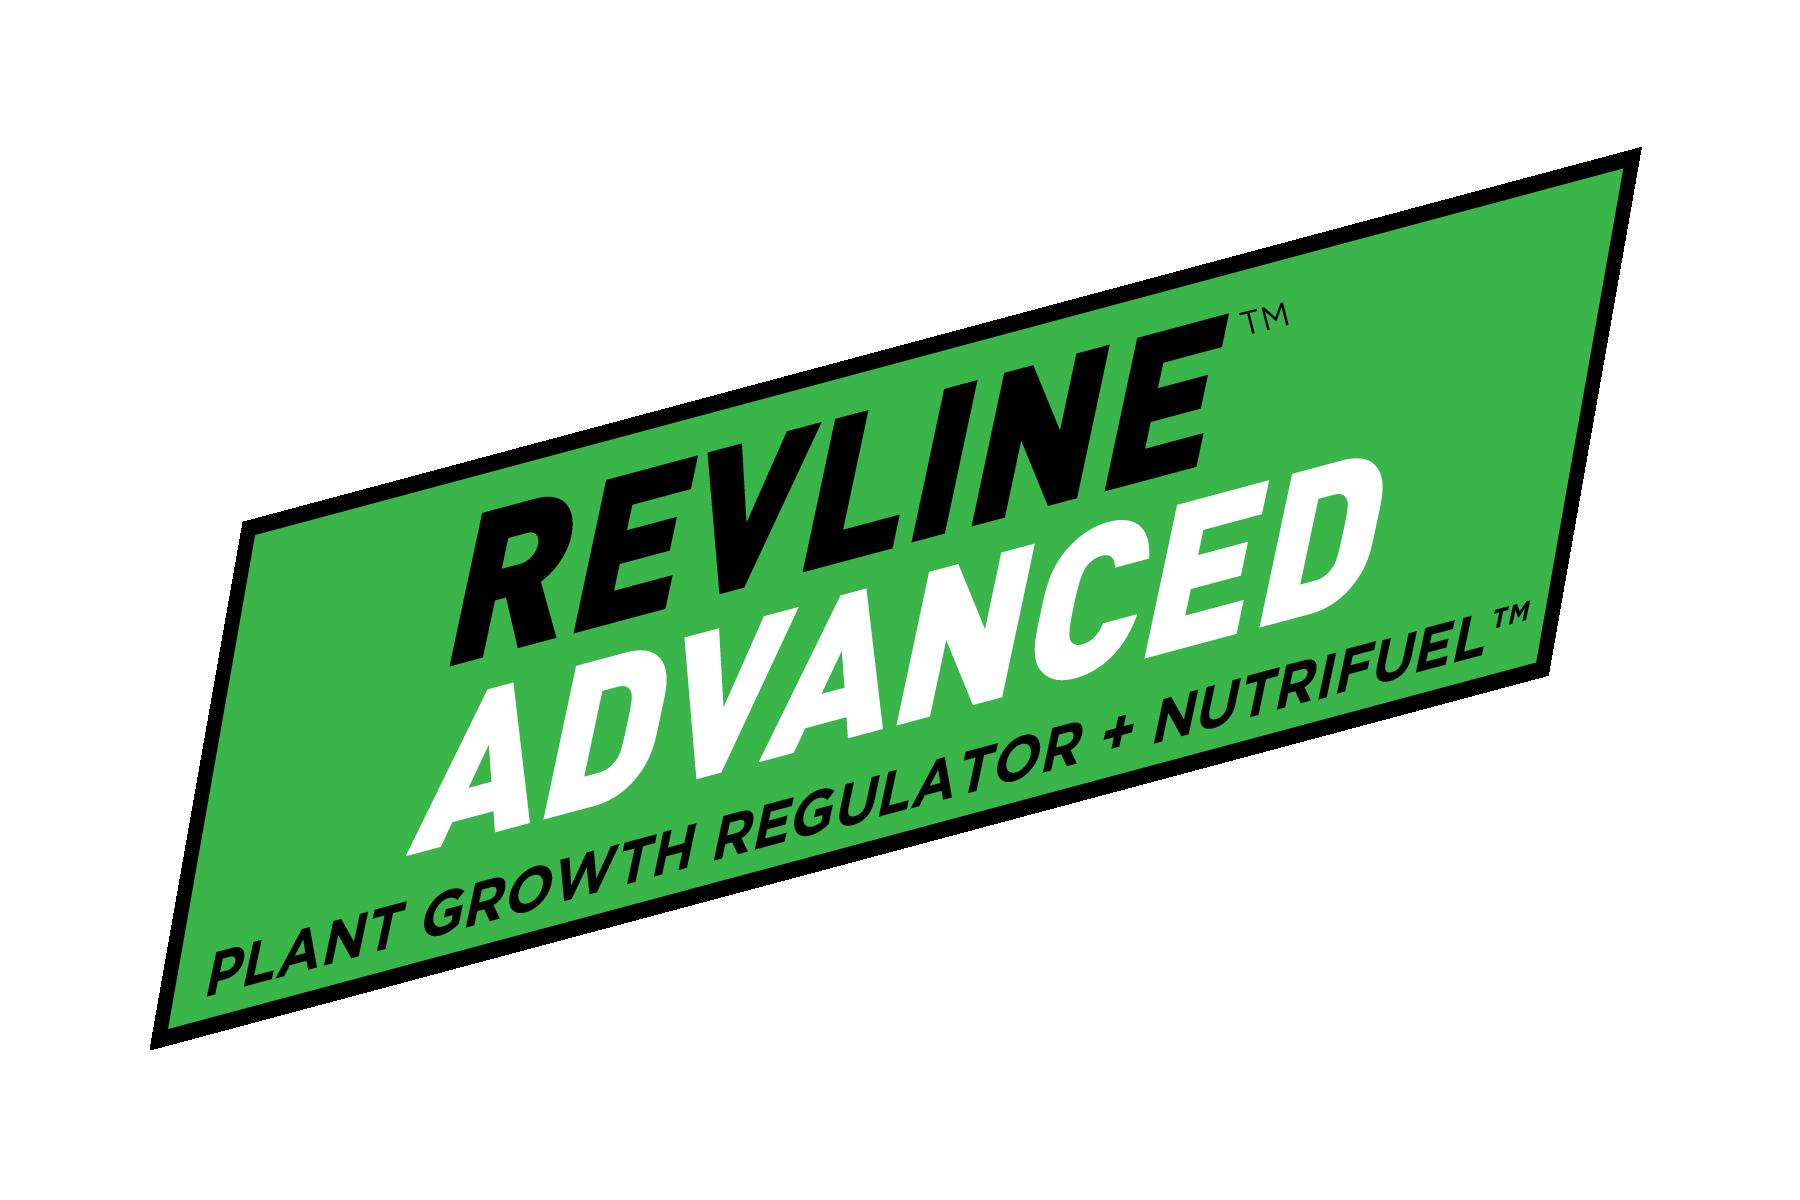 REVLINE ADVANCED